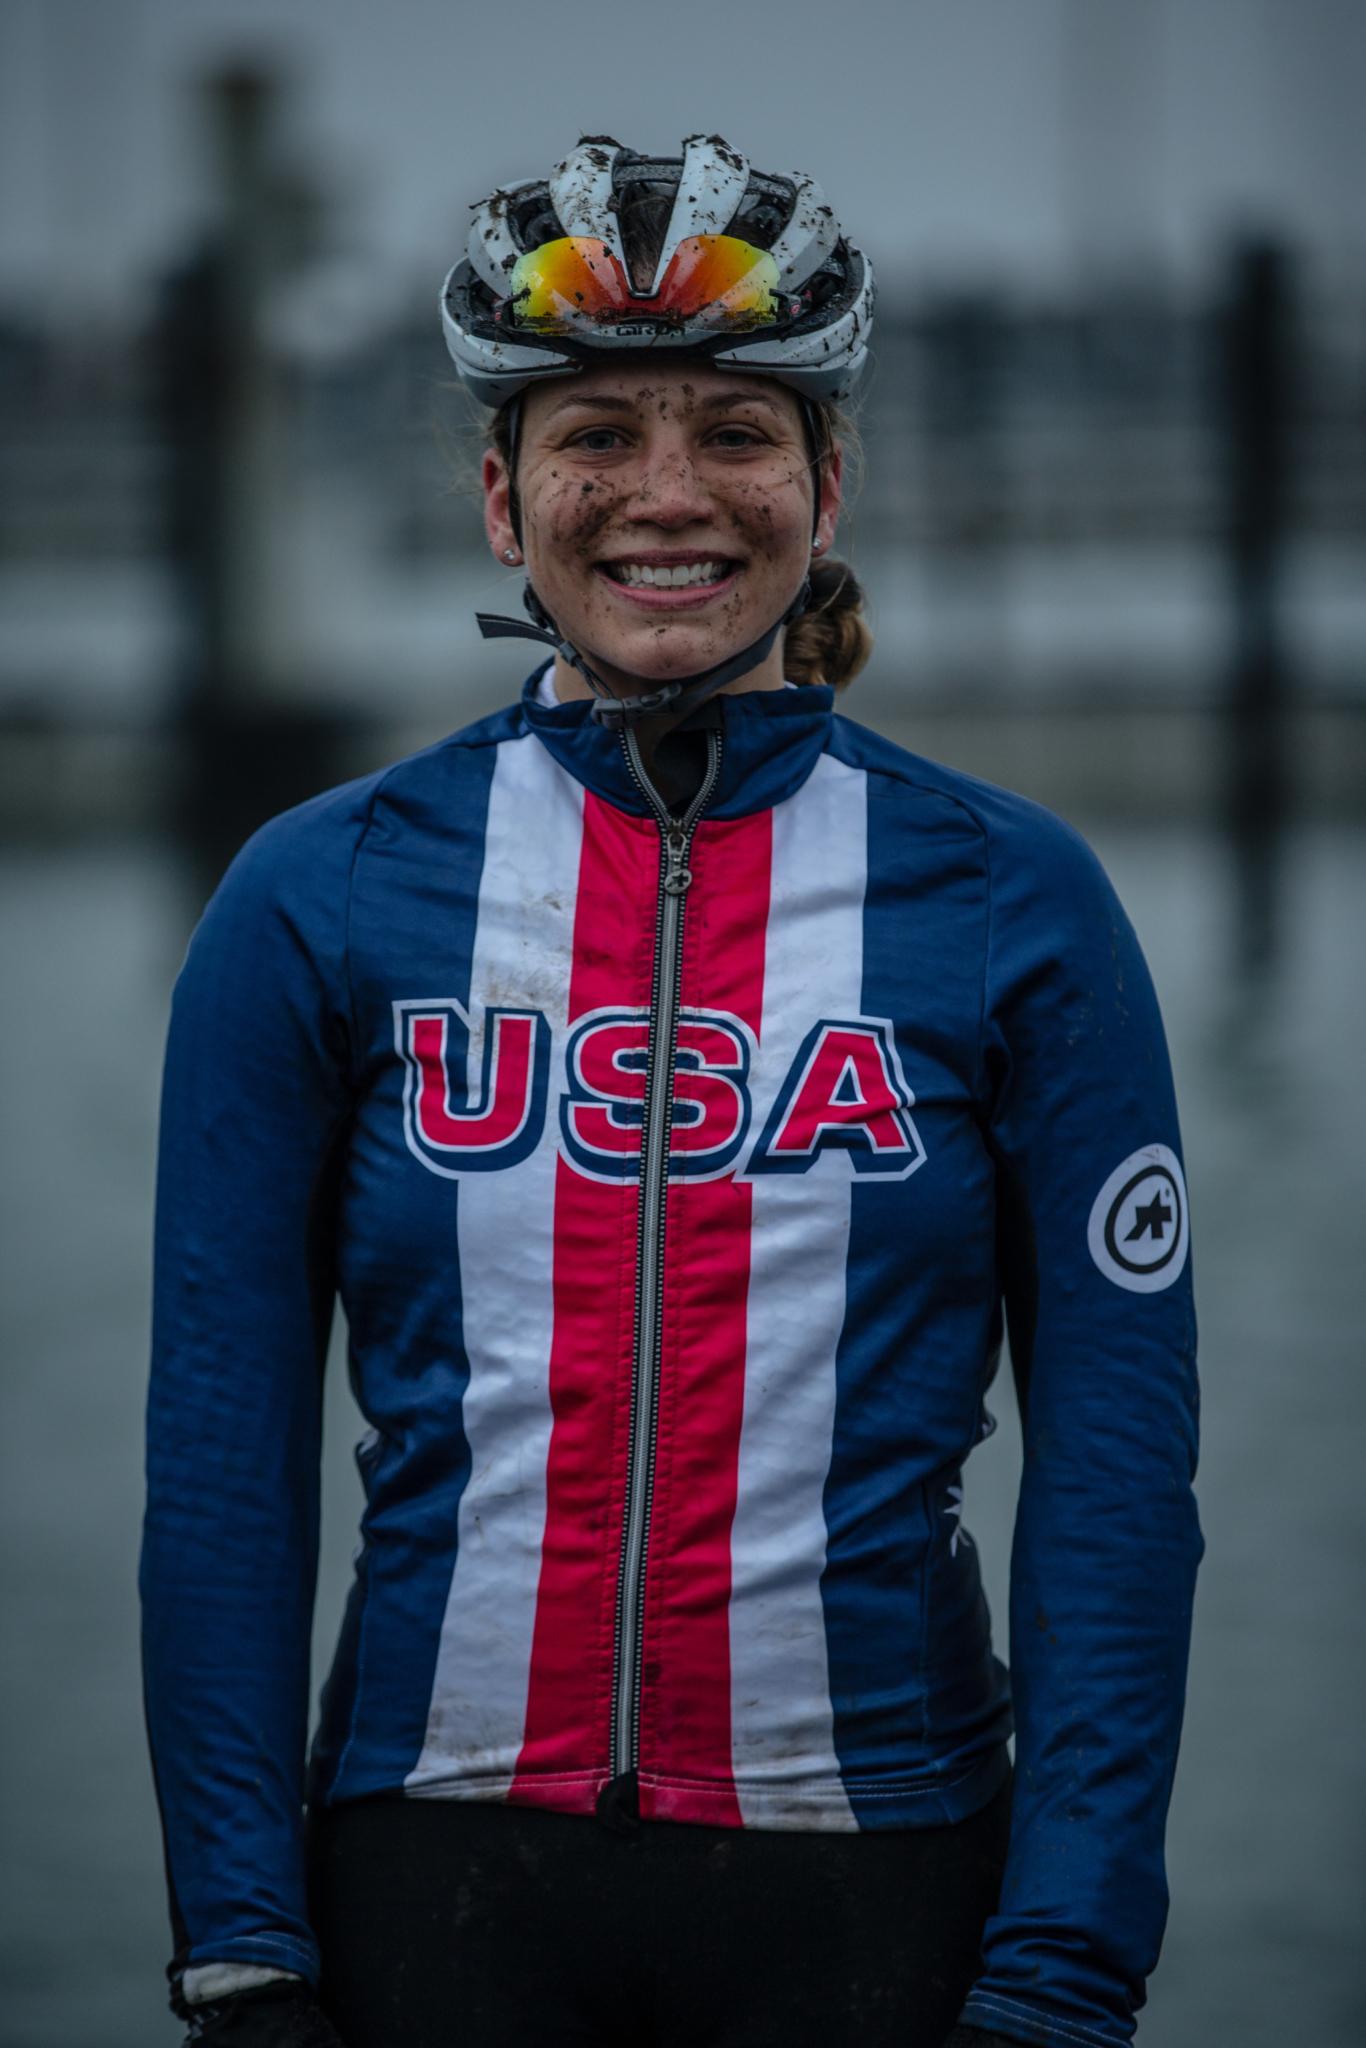 CX Athlete Feature: Rebecca Fahringer